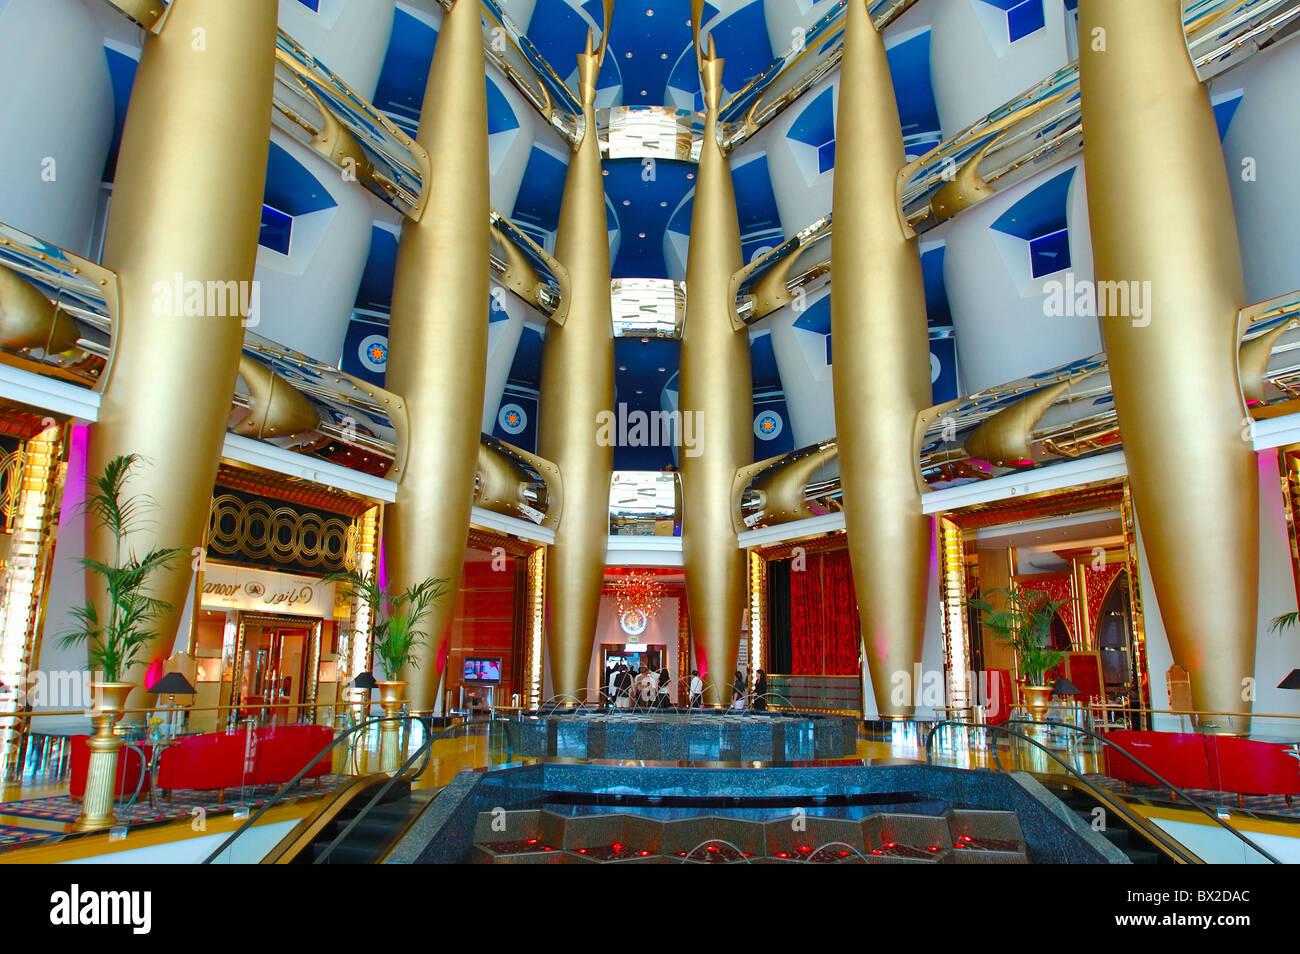 Burj al arab burj al arab transforms into head shoulders for Burj al arab hotel inside